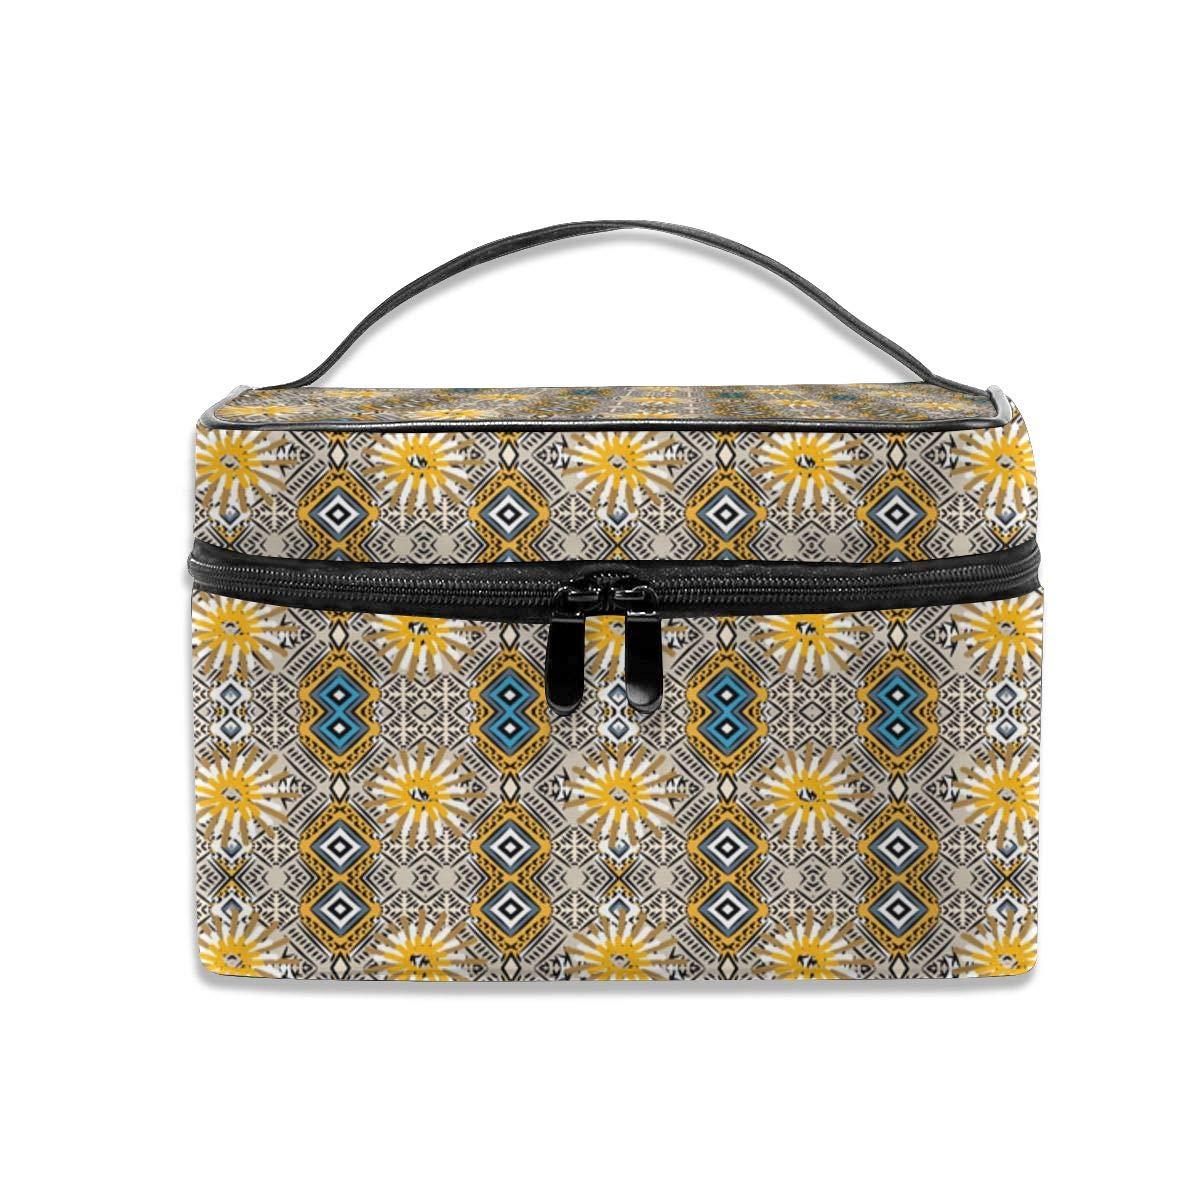 Floral Bohemian Makeup Bag Travel Toiletry BOX Portable Organizer Storage Cosmetic Train Case For Women Girls